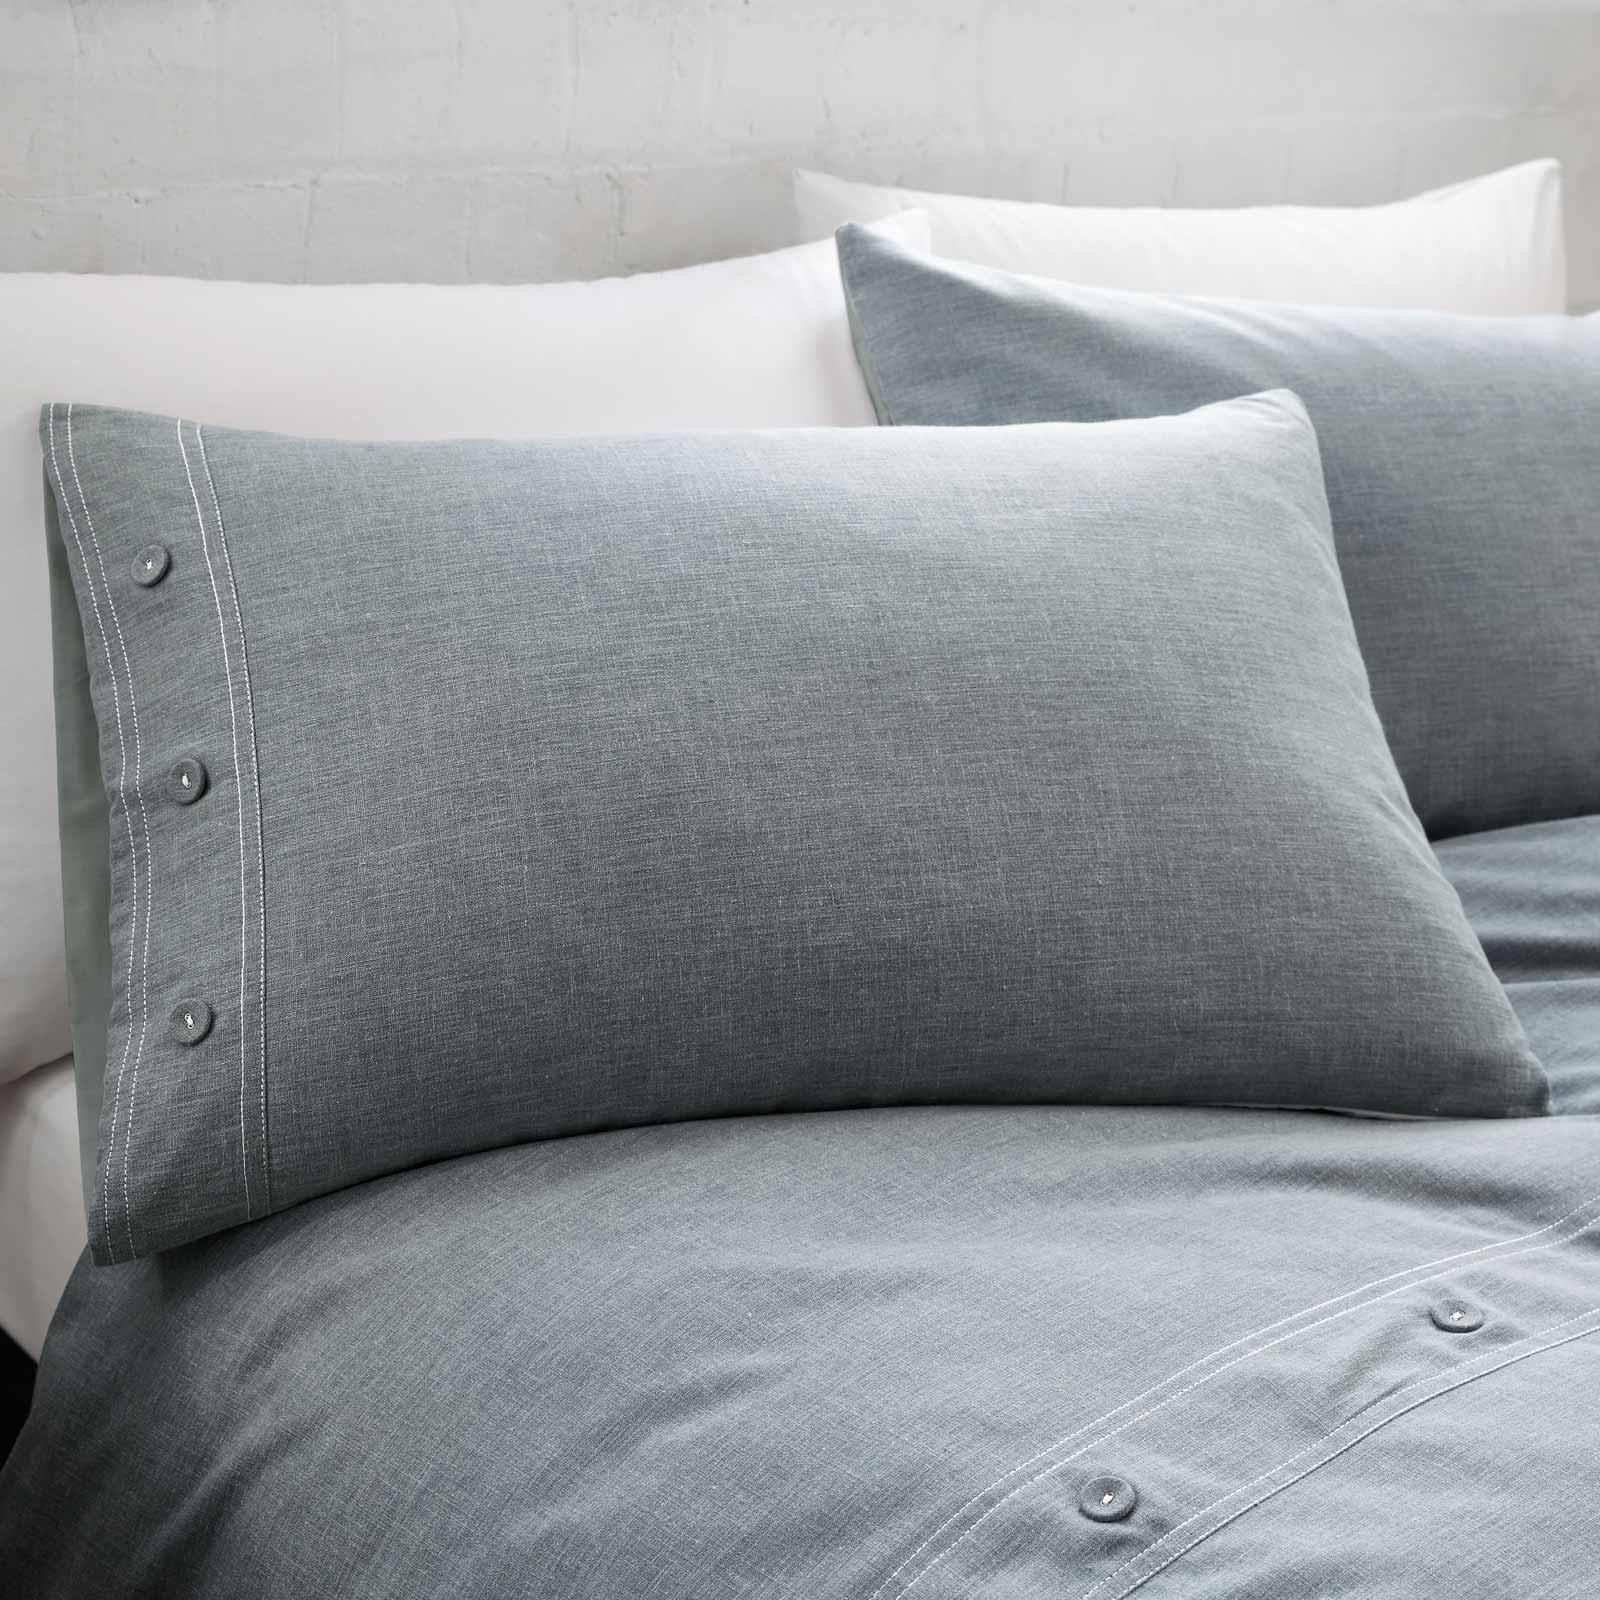 Azul-fundas-nordicas-Denim-Chambray-Boton-Detalle-de-lujo-cubierta-del-edredon-conjuntos-de-cama miniatura 11